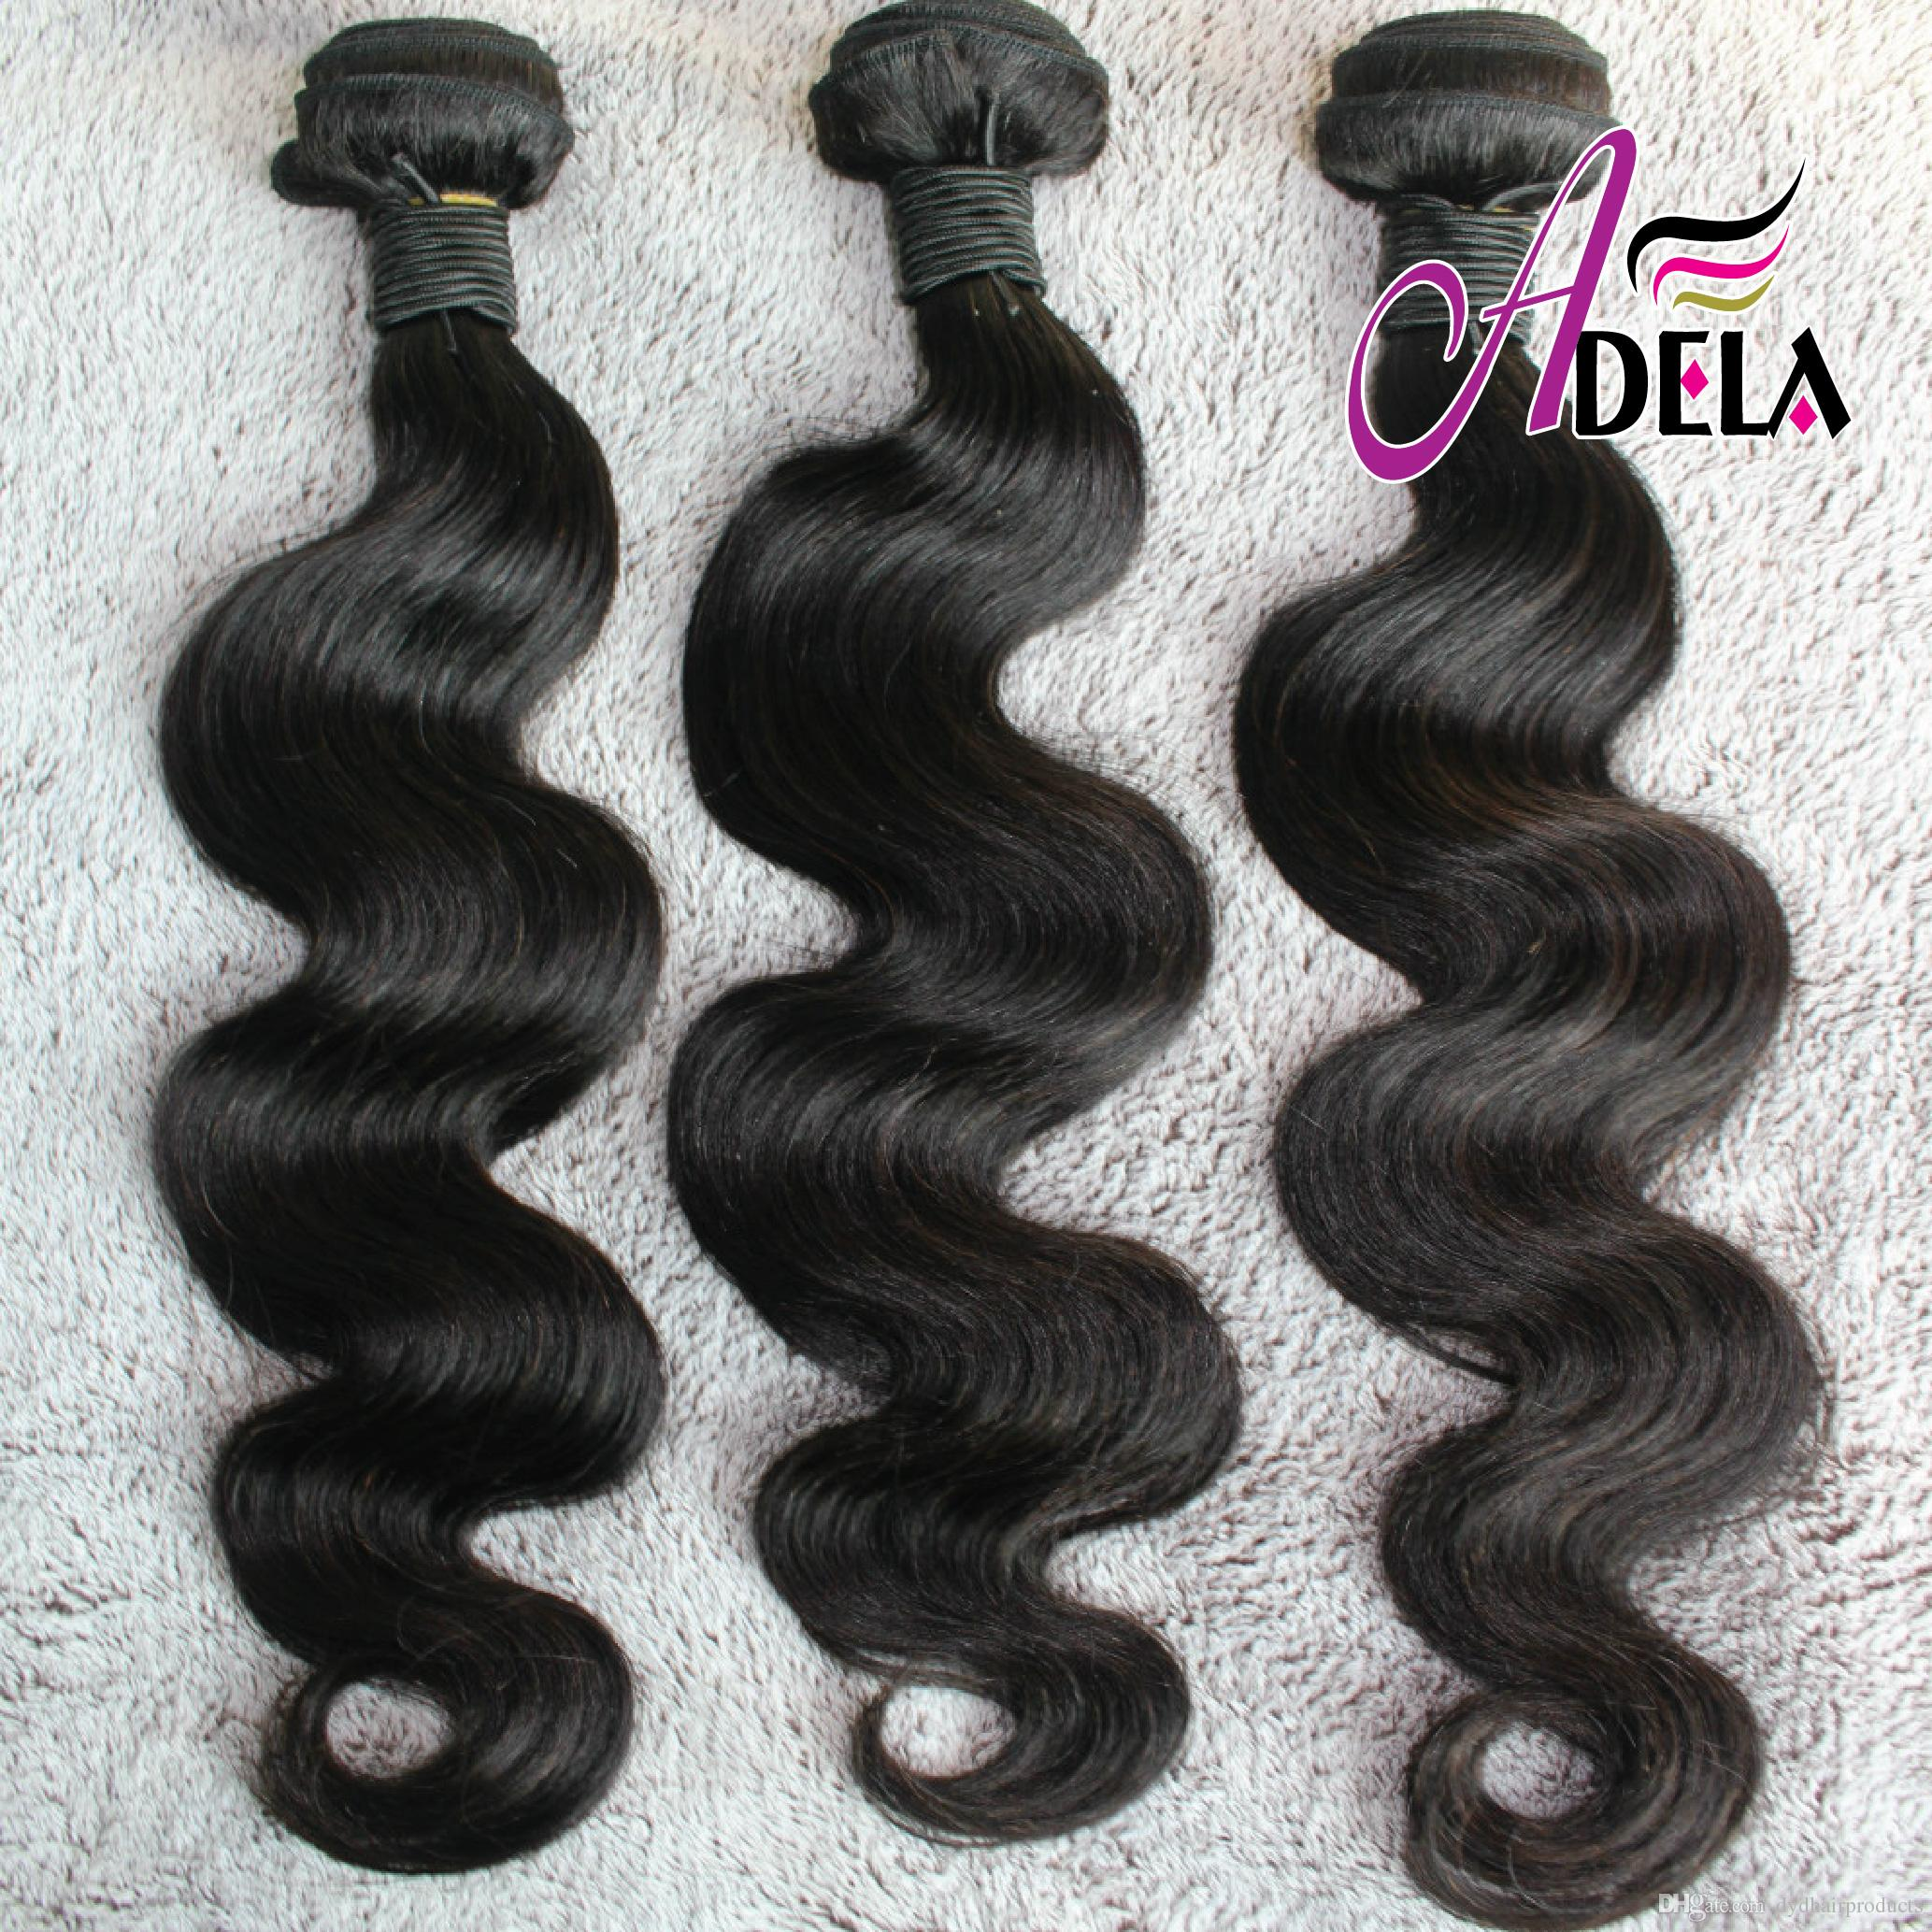 8a Cuticle Vietnamese Virgin Hair Weave 8 30inch Body Wave Natural